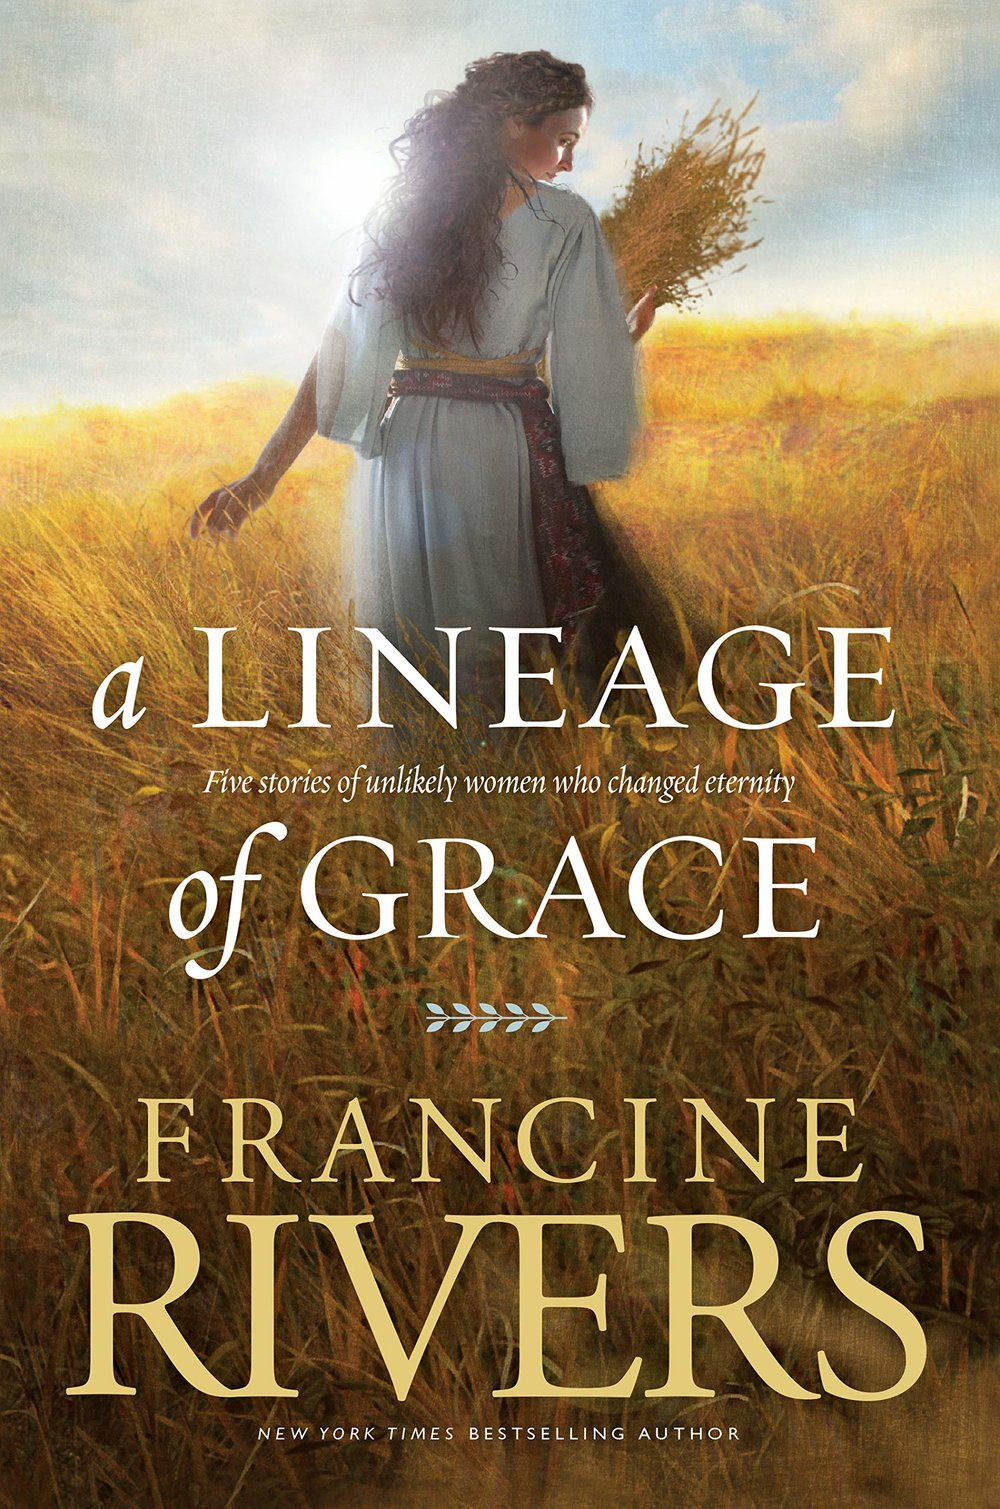 a lineage of grace francine rivers.jpg